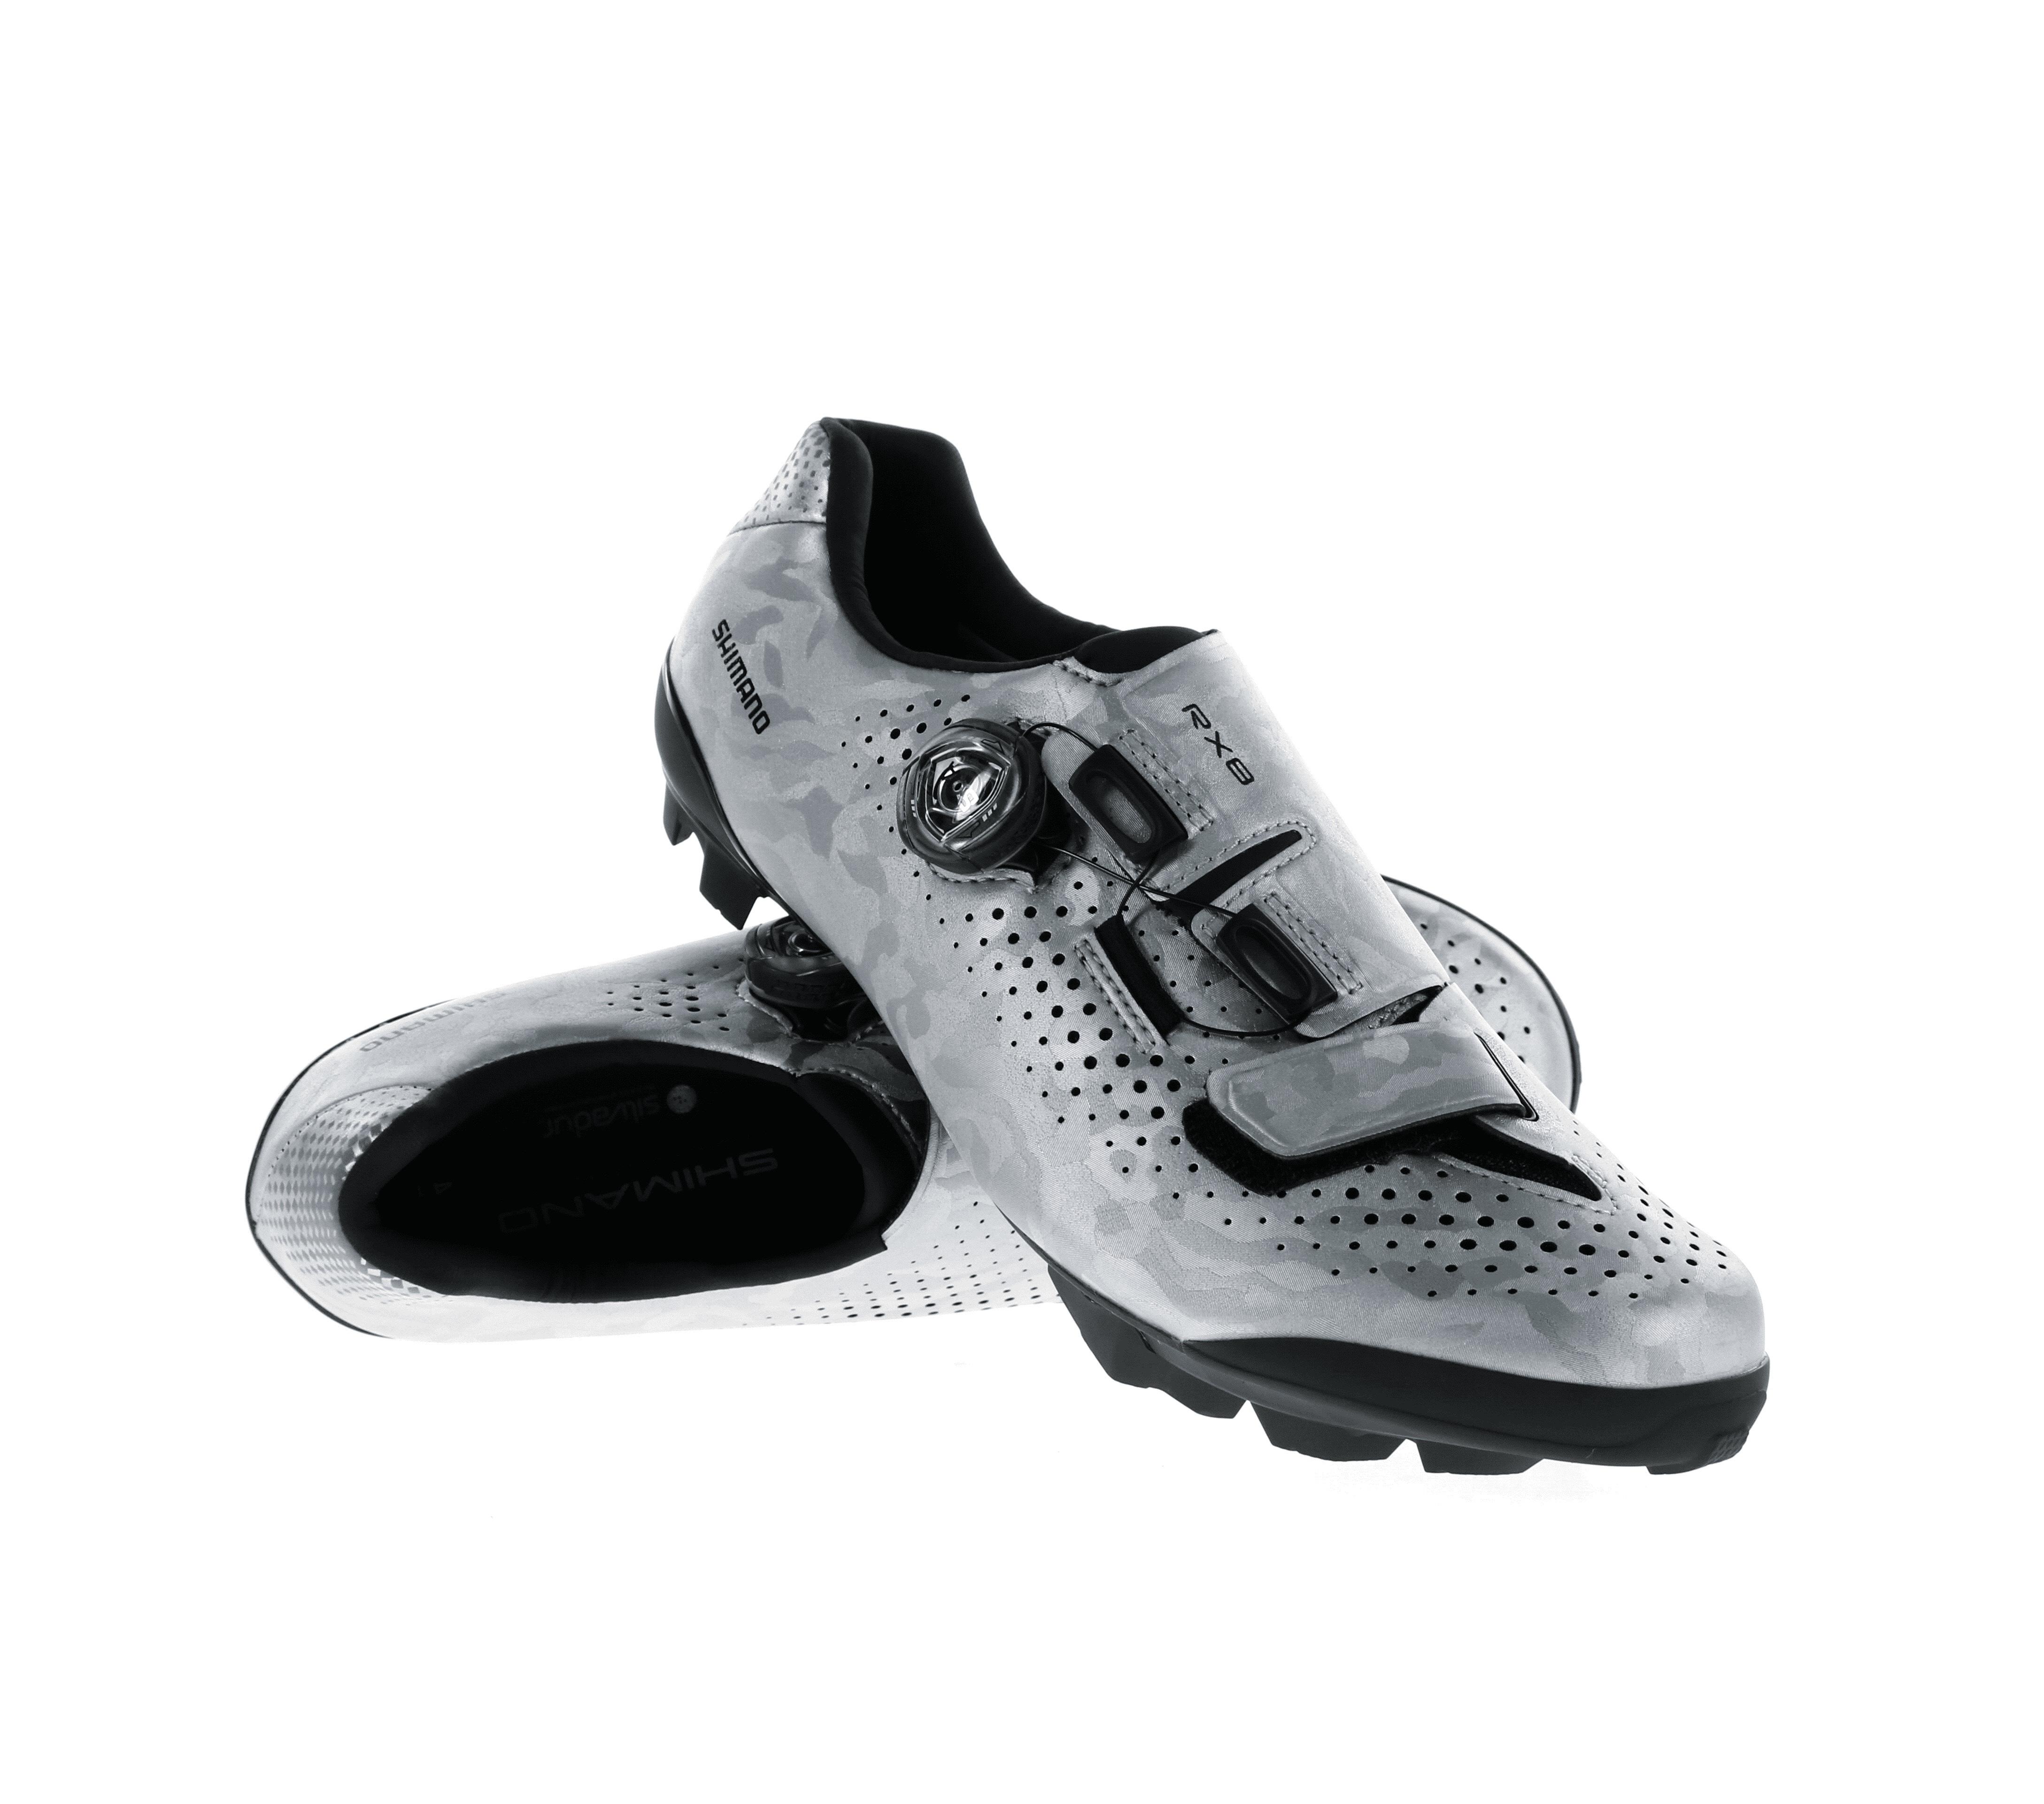 [nubuk-bikes] Shimano SH-RX800 Gravel-Schuhe (Gr. 38 / 40 / 42 )